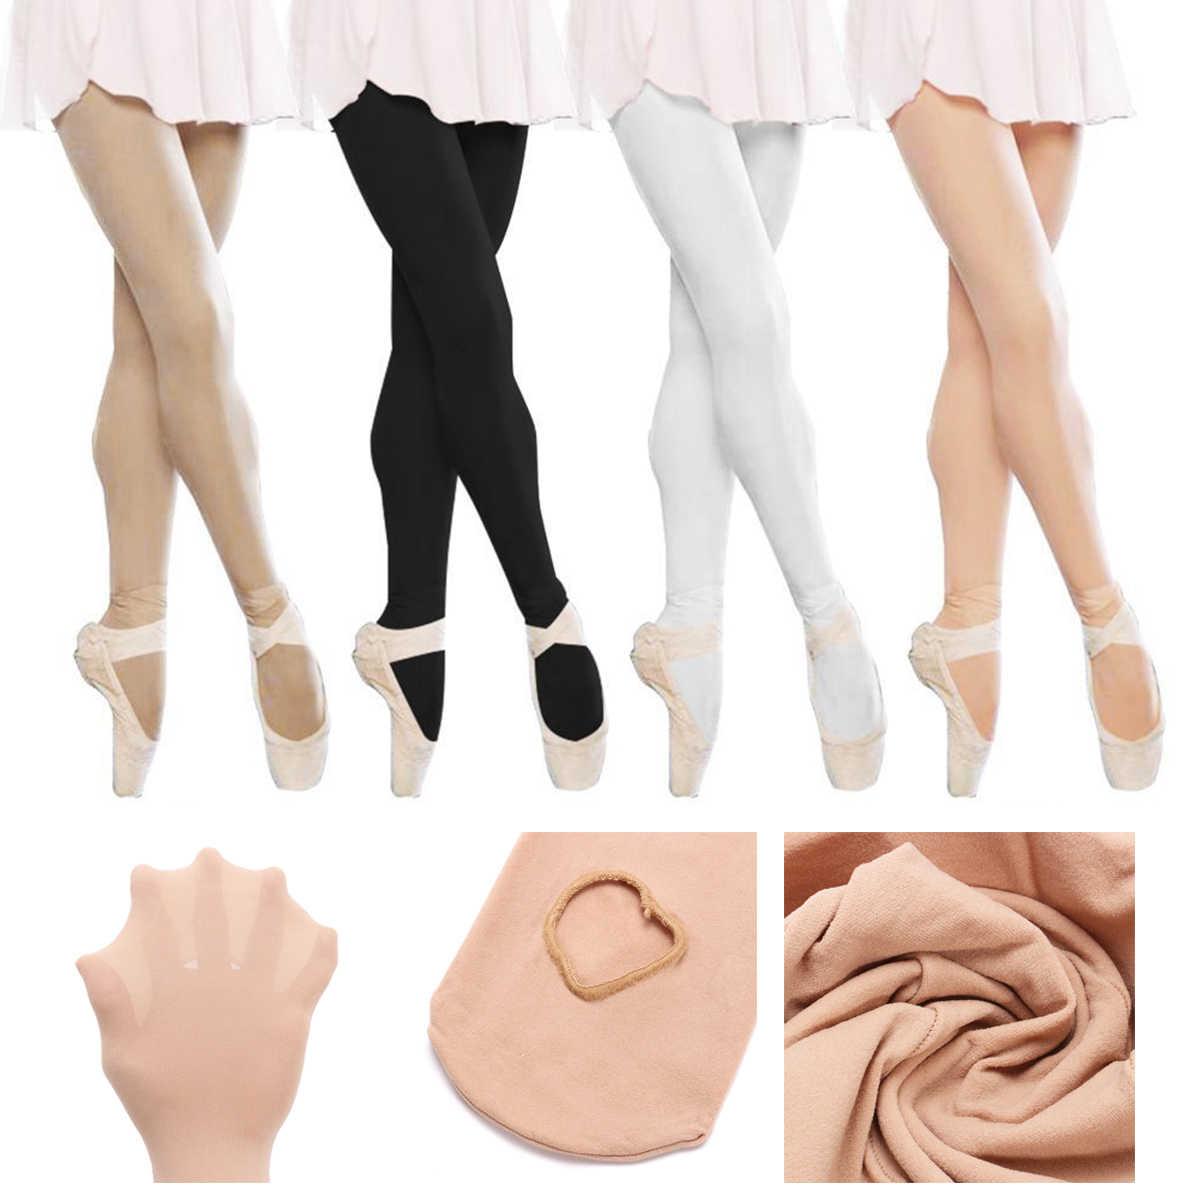 7ff21d6e06b6b Detail Feedback Questions about Children Girls Convertible Tights Ballet  Dance Stocking Socks Ballet Pantyhose Gymnastics Leotards Kids Ladies Tap  Dance ...